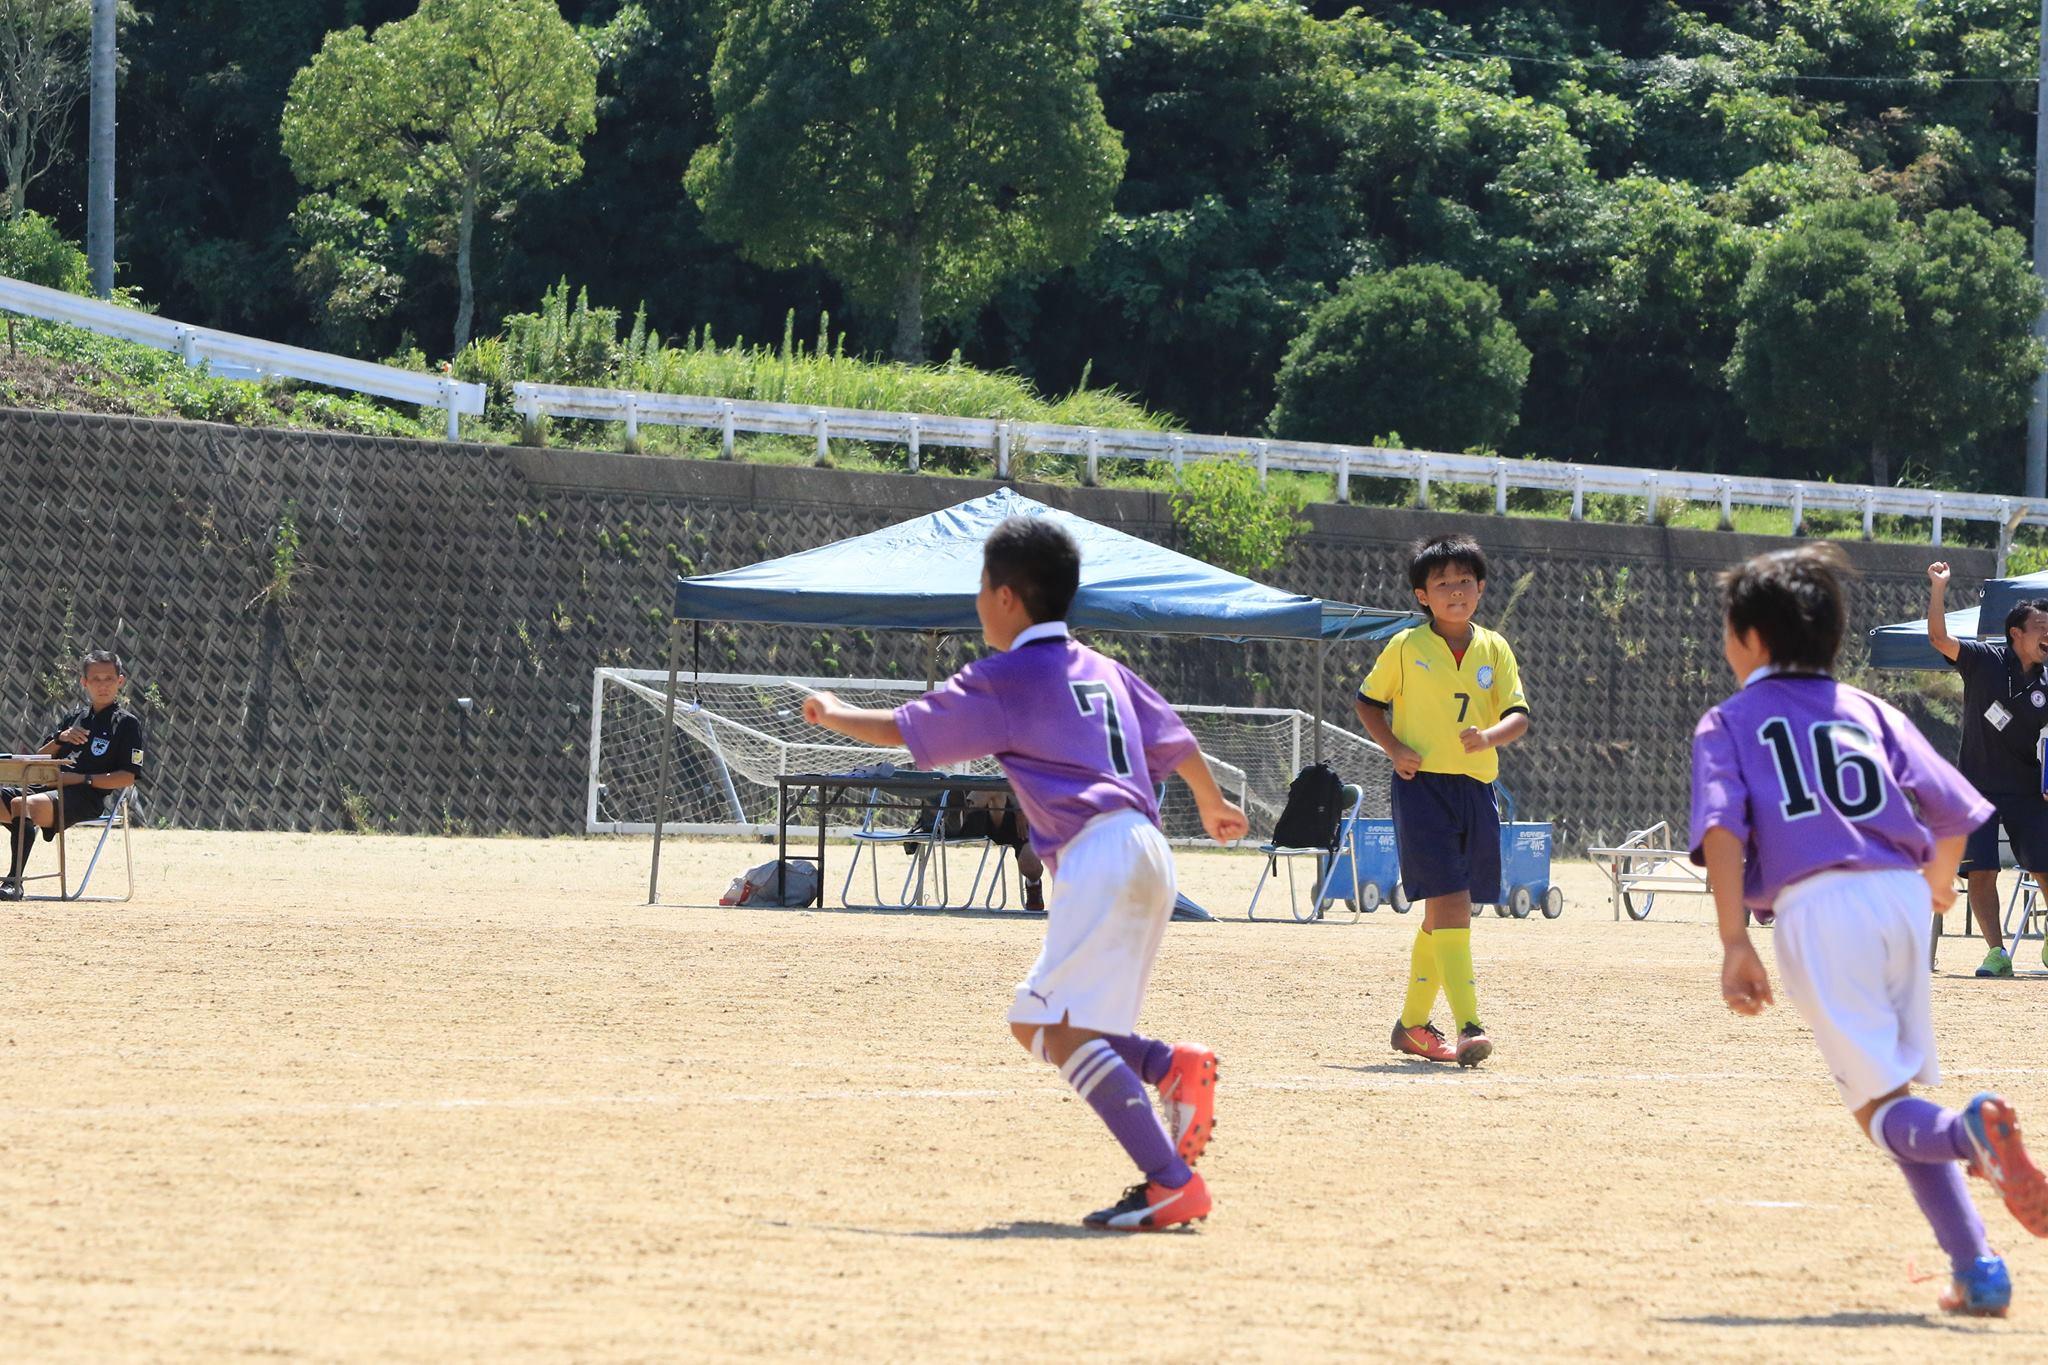 2016U10しんきんカップ中西部予選vs島田第一ゴールシーン04.jpg